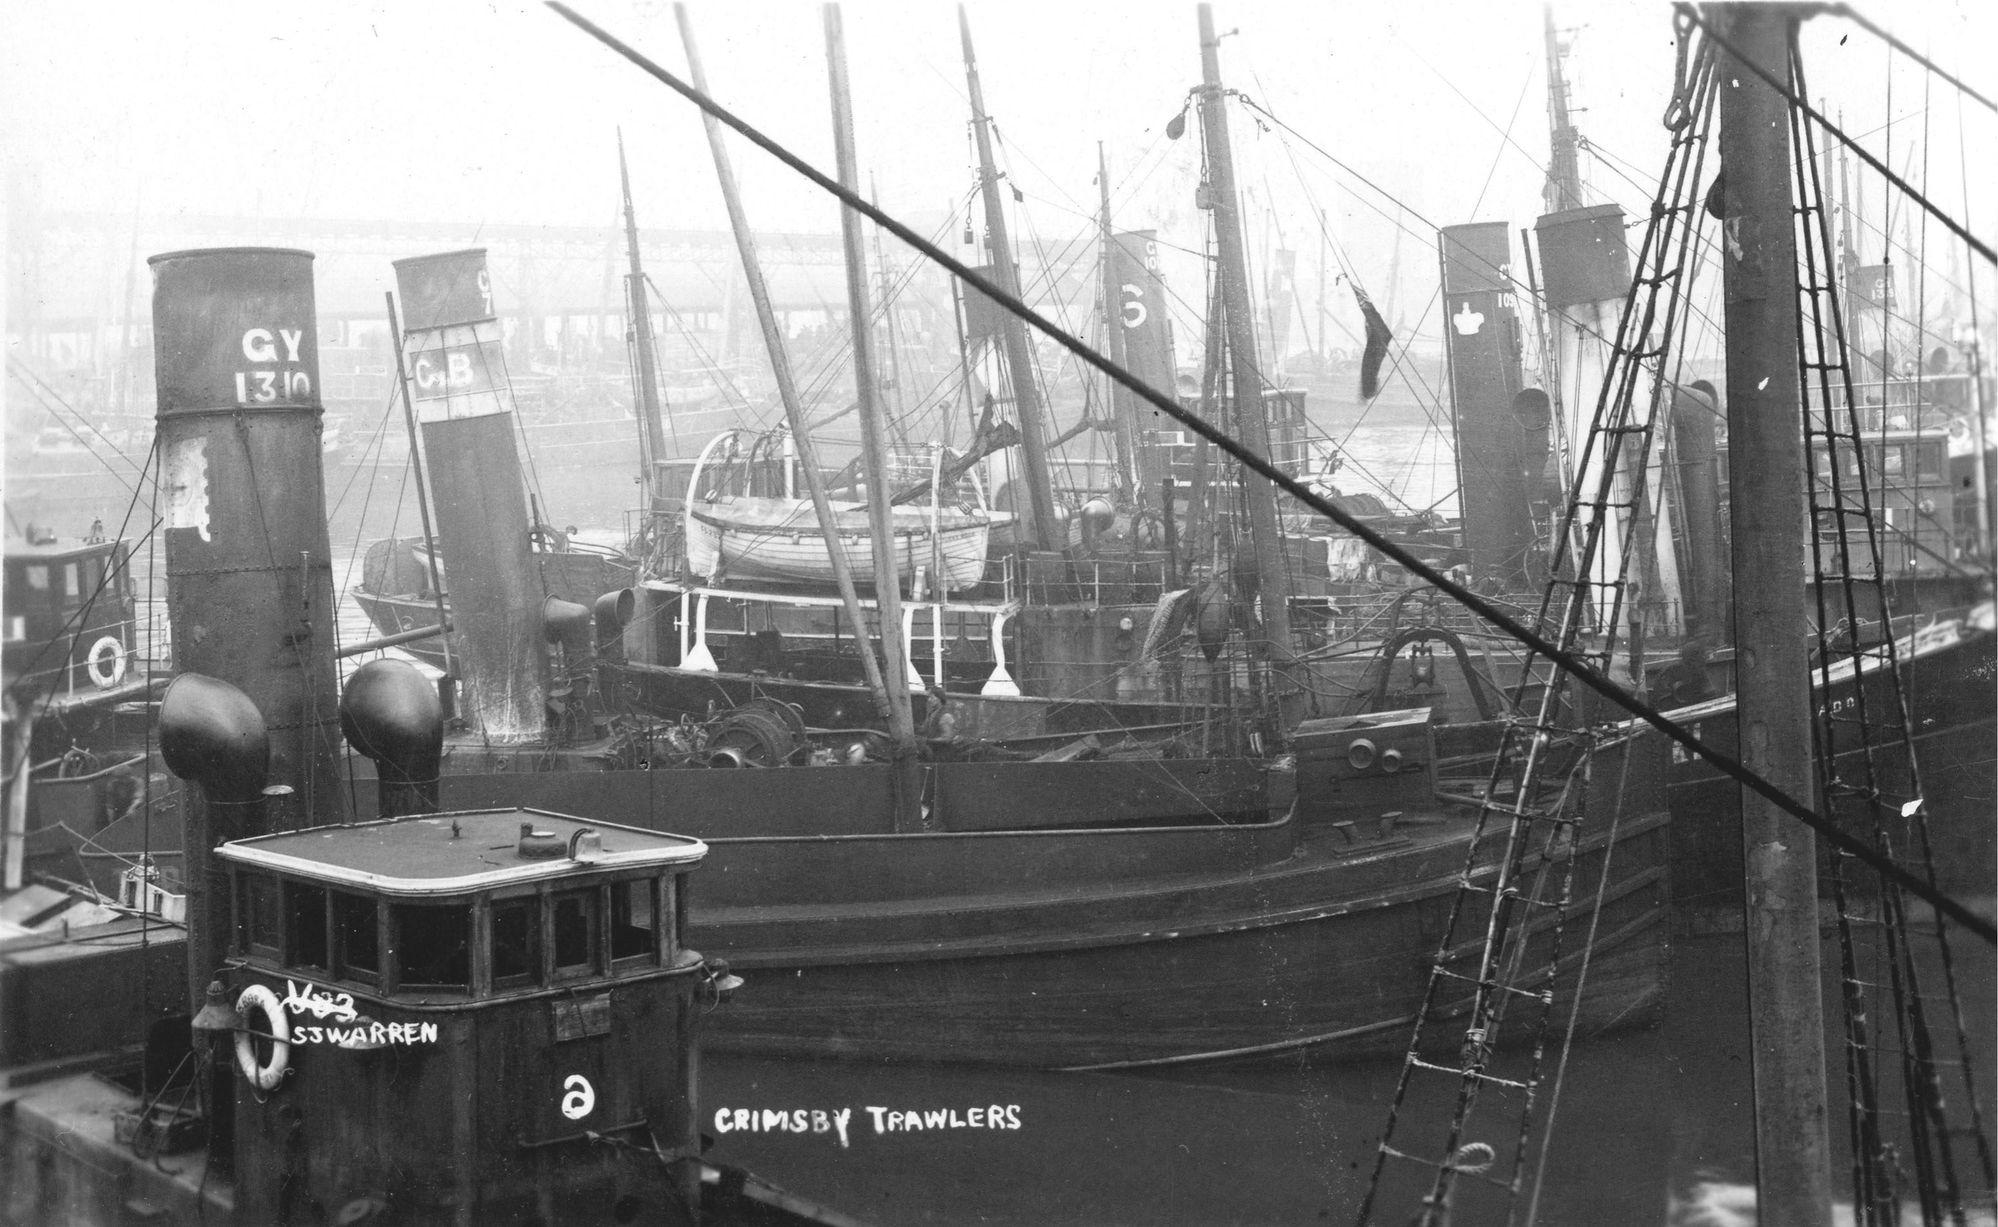 Fishing Trawlers at Grimsby Fishing Docks